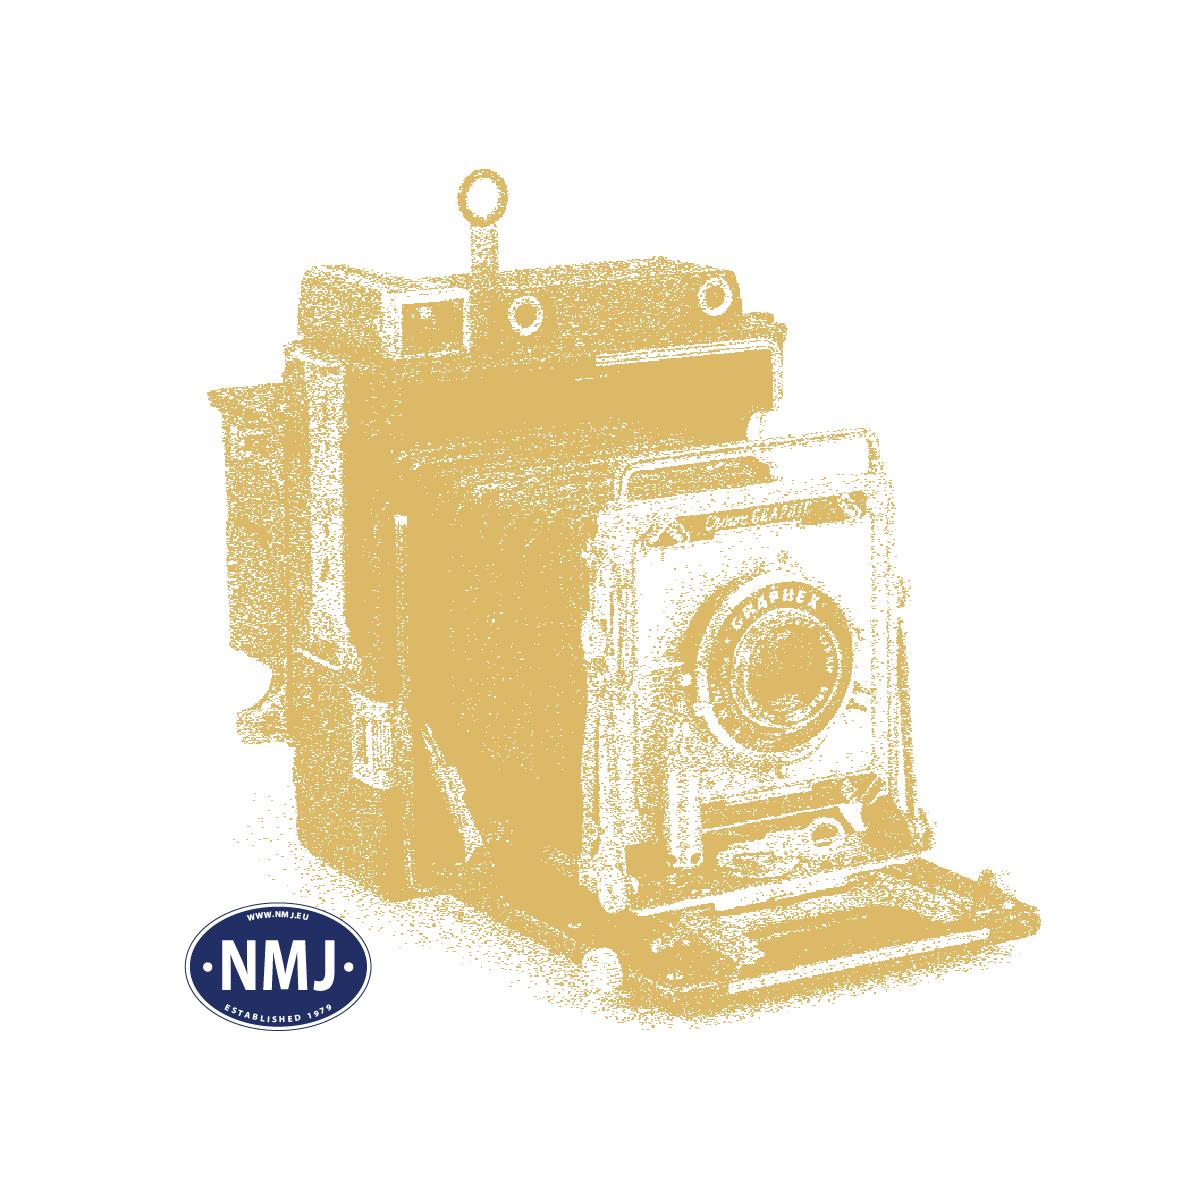 NMJT145301 - NMJ Topline CFL 1602, Spur 0